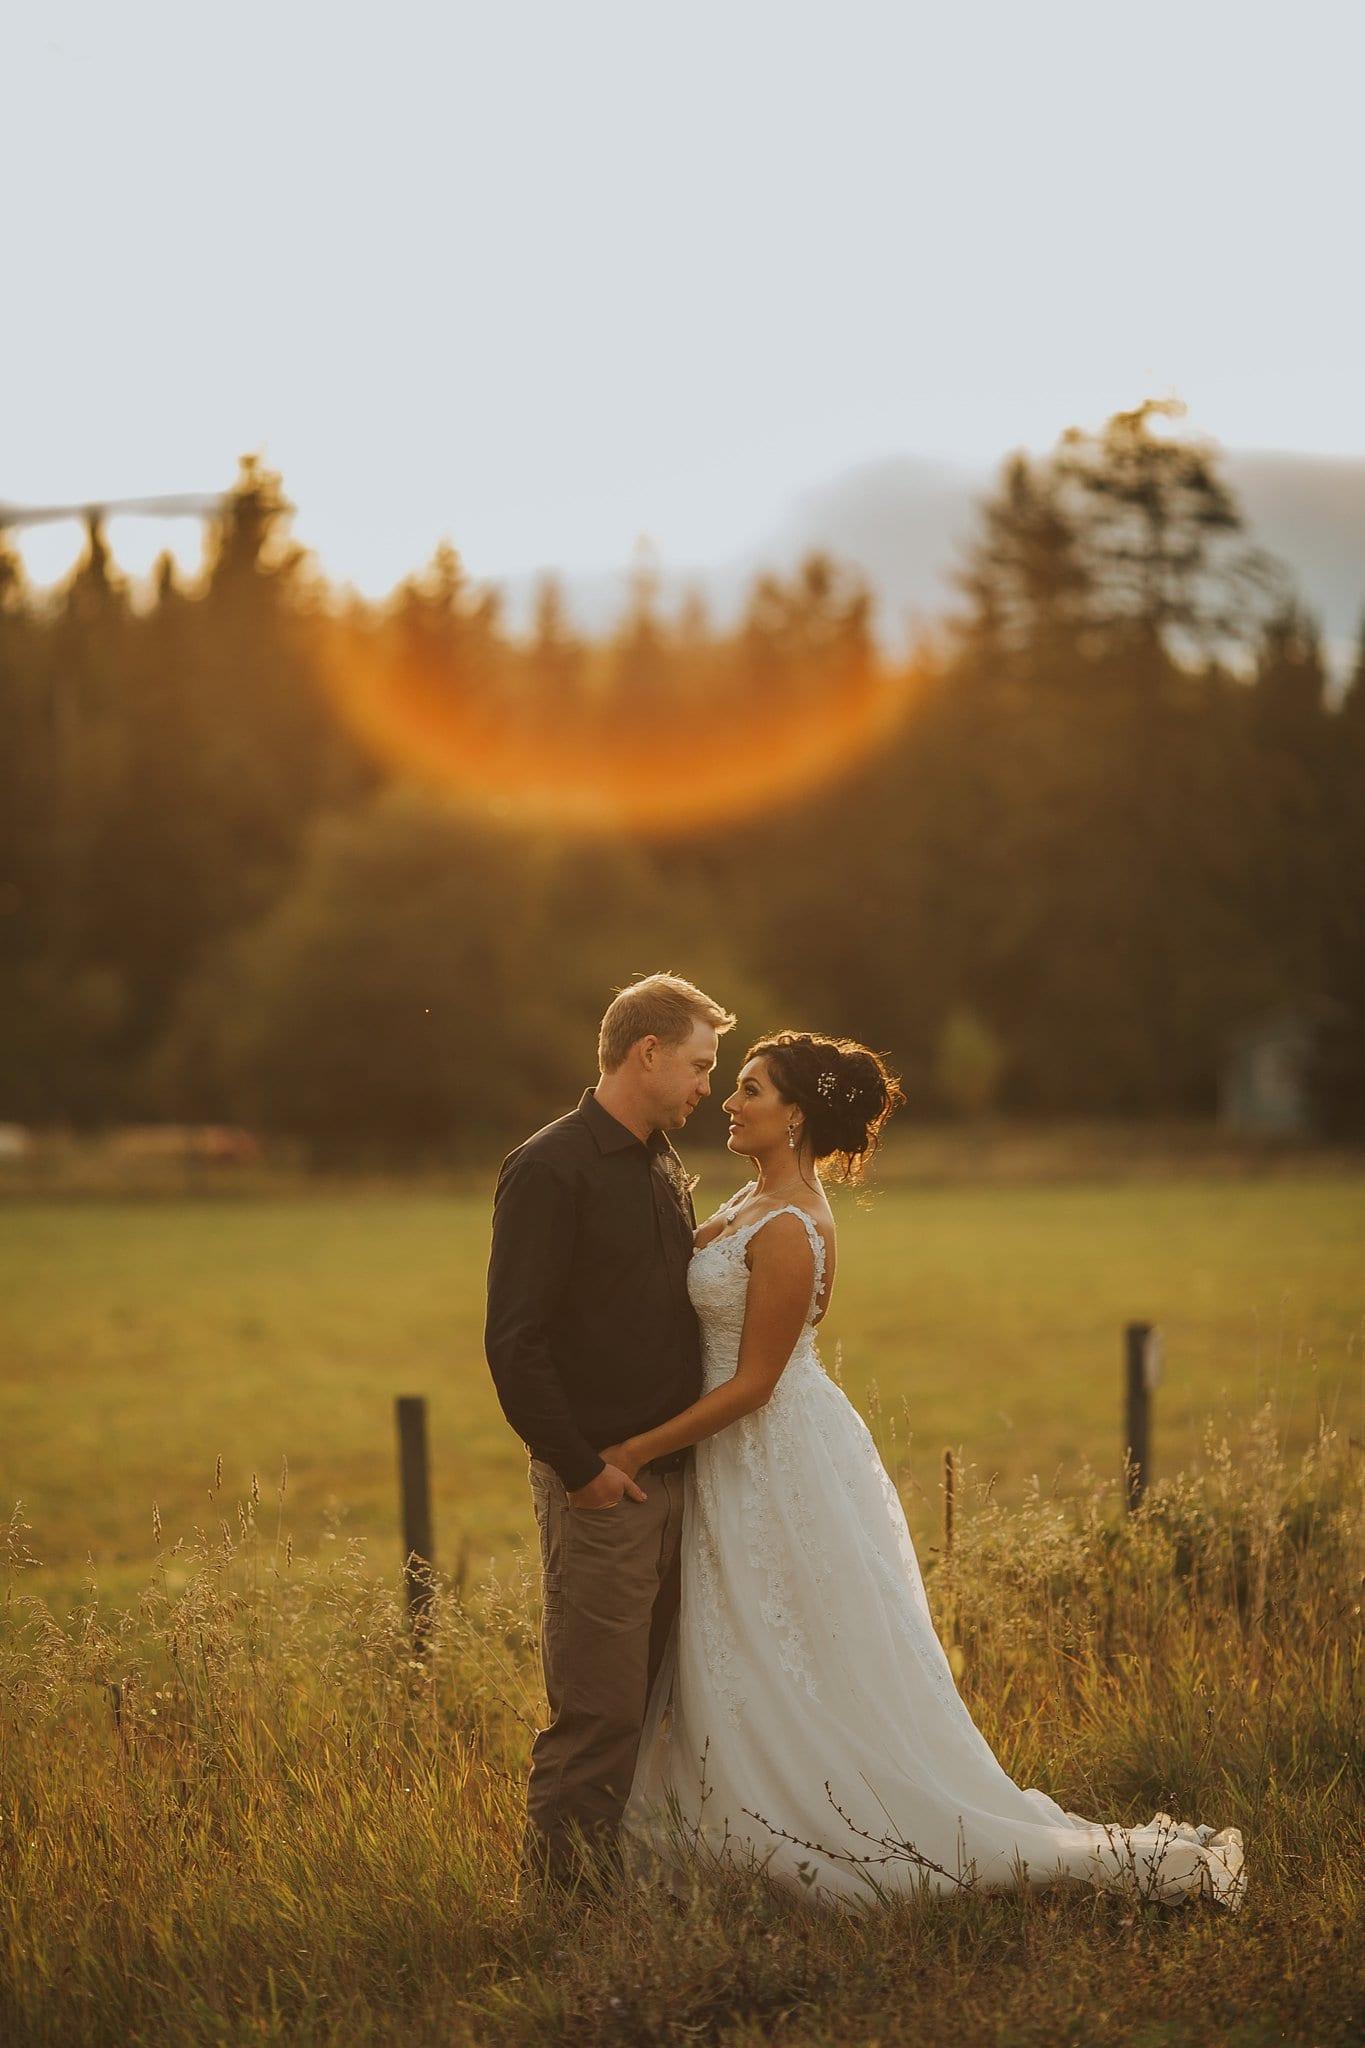 Cherryville BC Wedding Photographer Barnett Photography